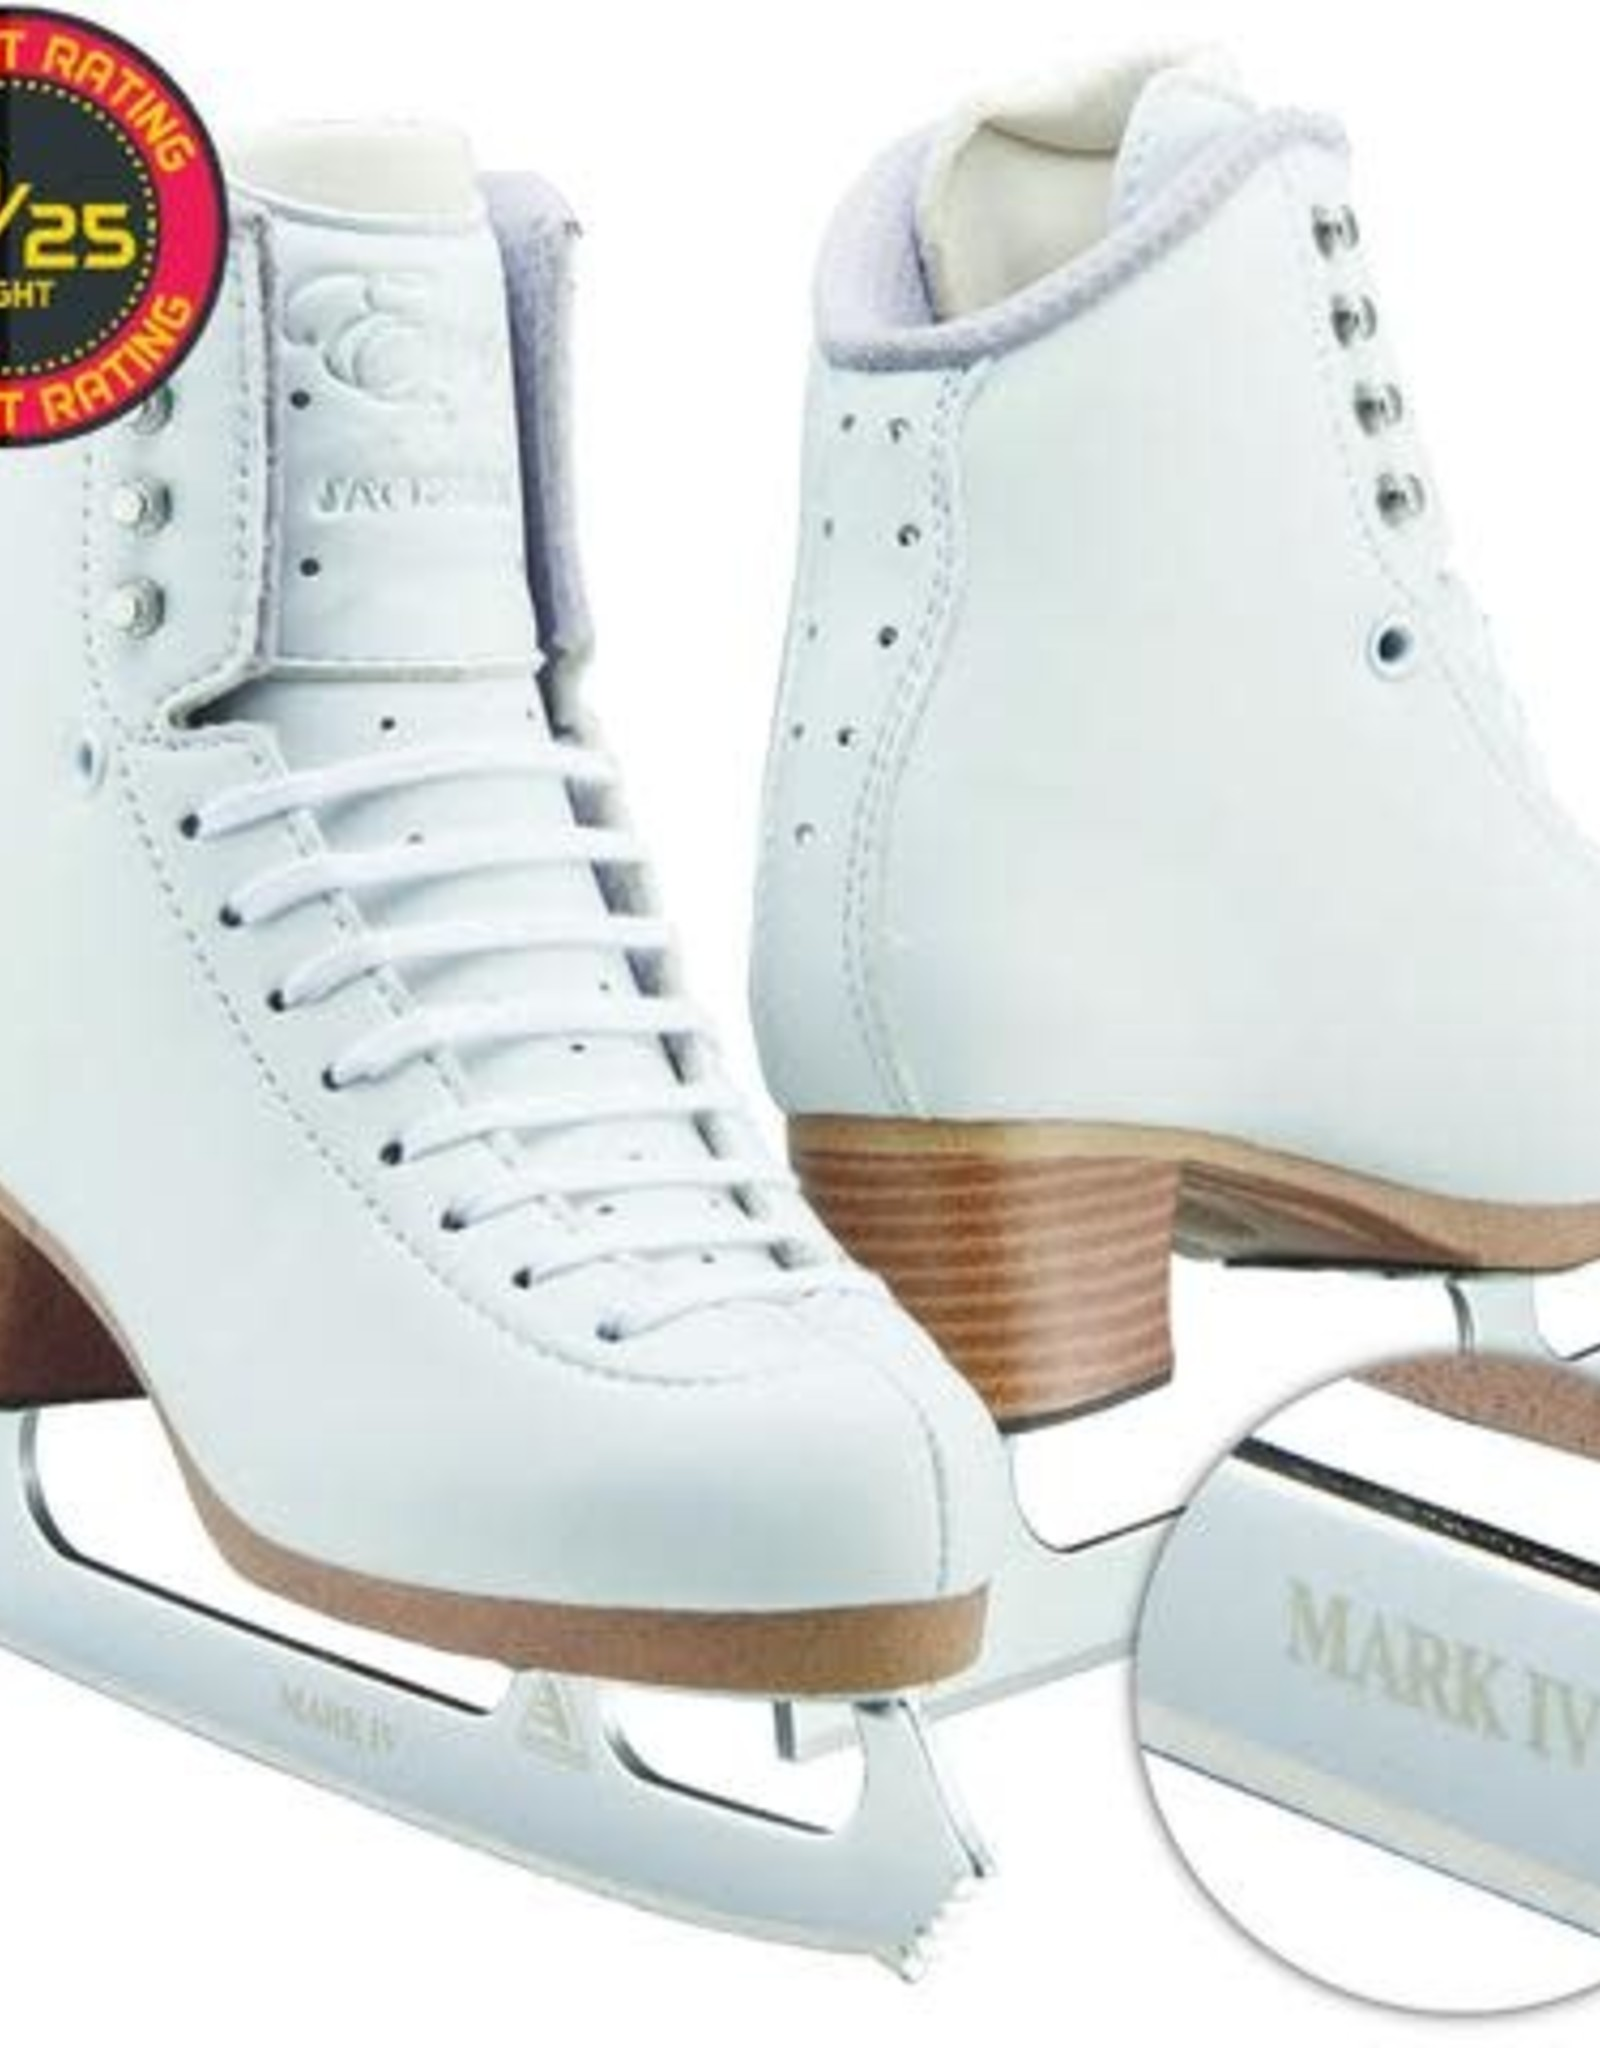 Jackson Evo Fusion Kunstschaatsen + MarkIV Blade W